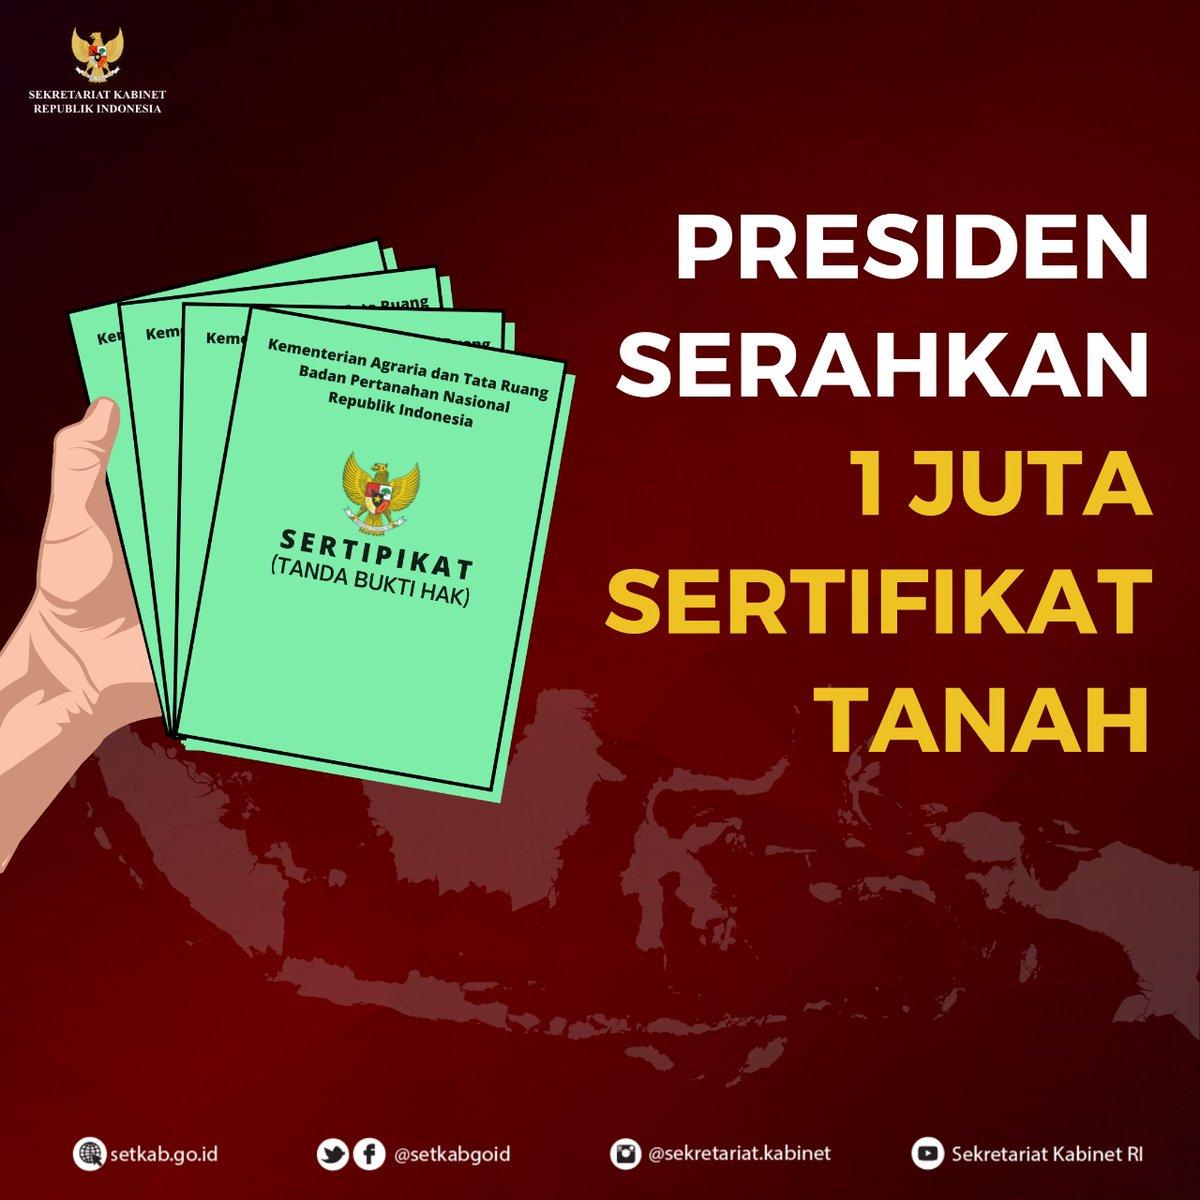 Sekretariat Kabinet On Twitter Kawankabinet Senin 9 11 Kemarin Presiden Jokowi Menyerahkan 1 Juta Sertifikat Tanah Untuk Rakyat Di Istana Negara Jakarta Nah Simak Yuk Apa Saja Sih Fakta Dibalik Penyerahan Sertifikat Tanah